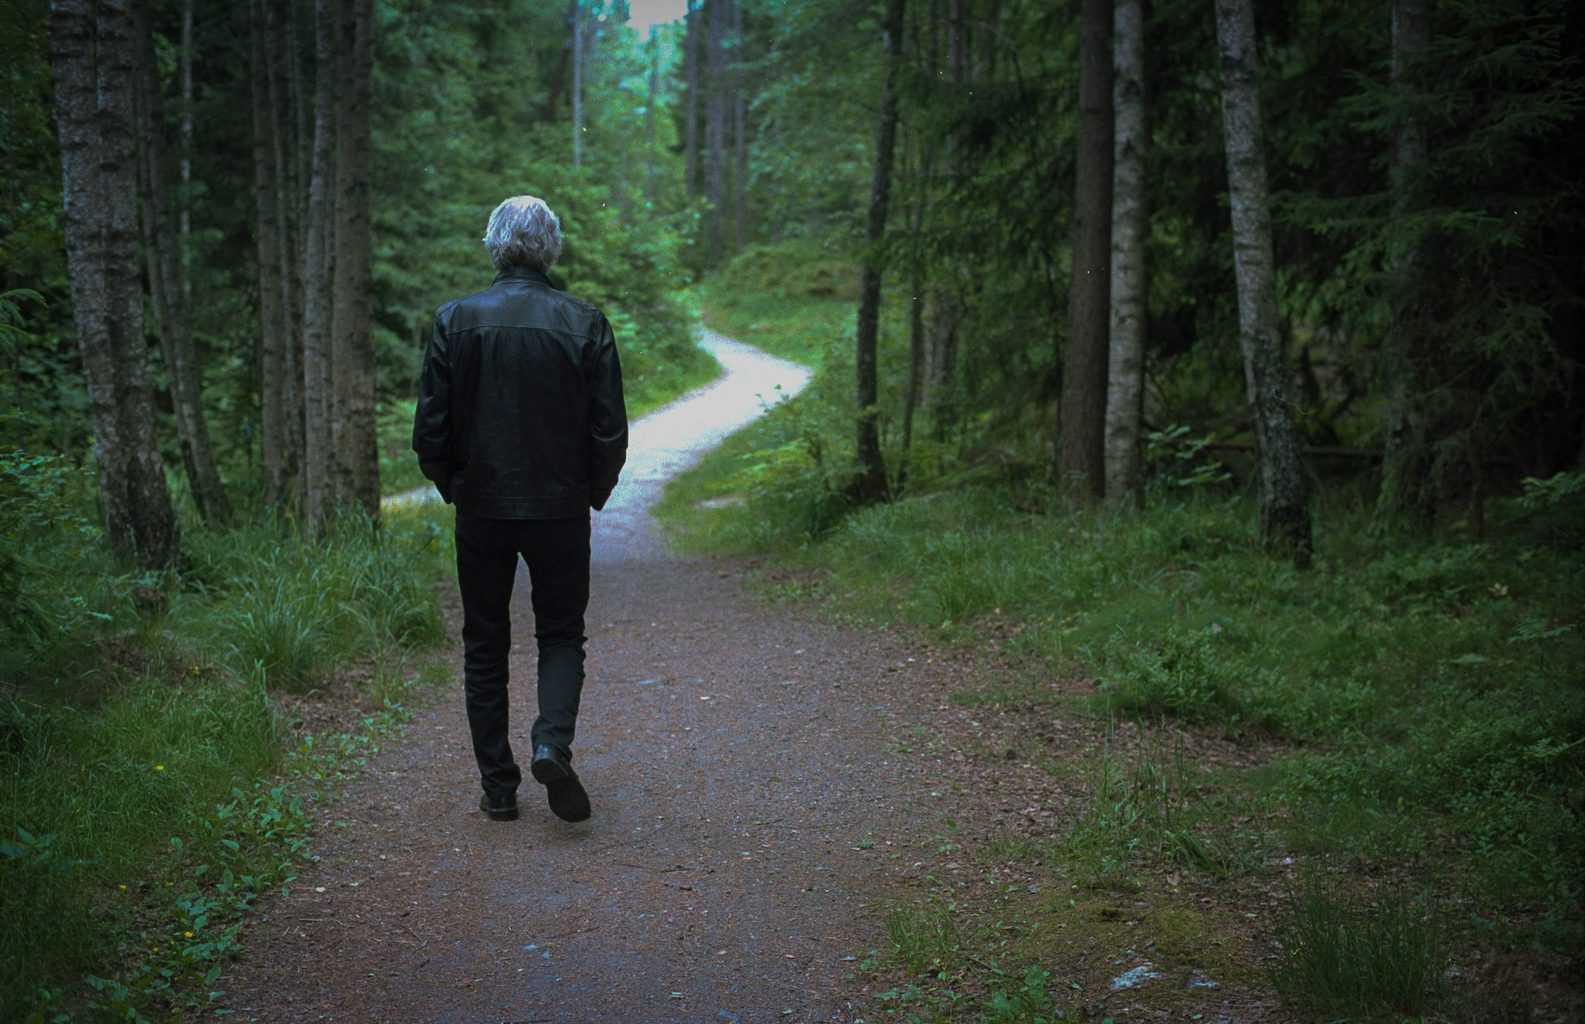 Foto: Asbjørn Ribe